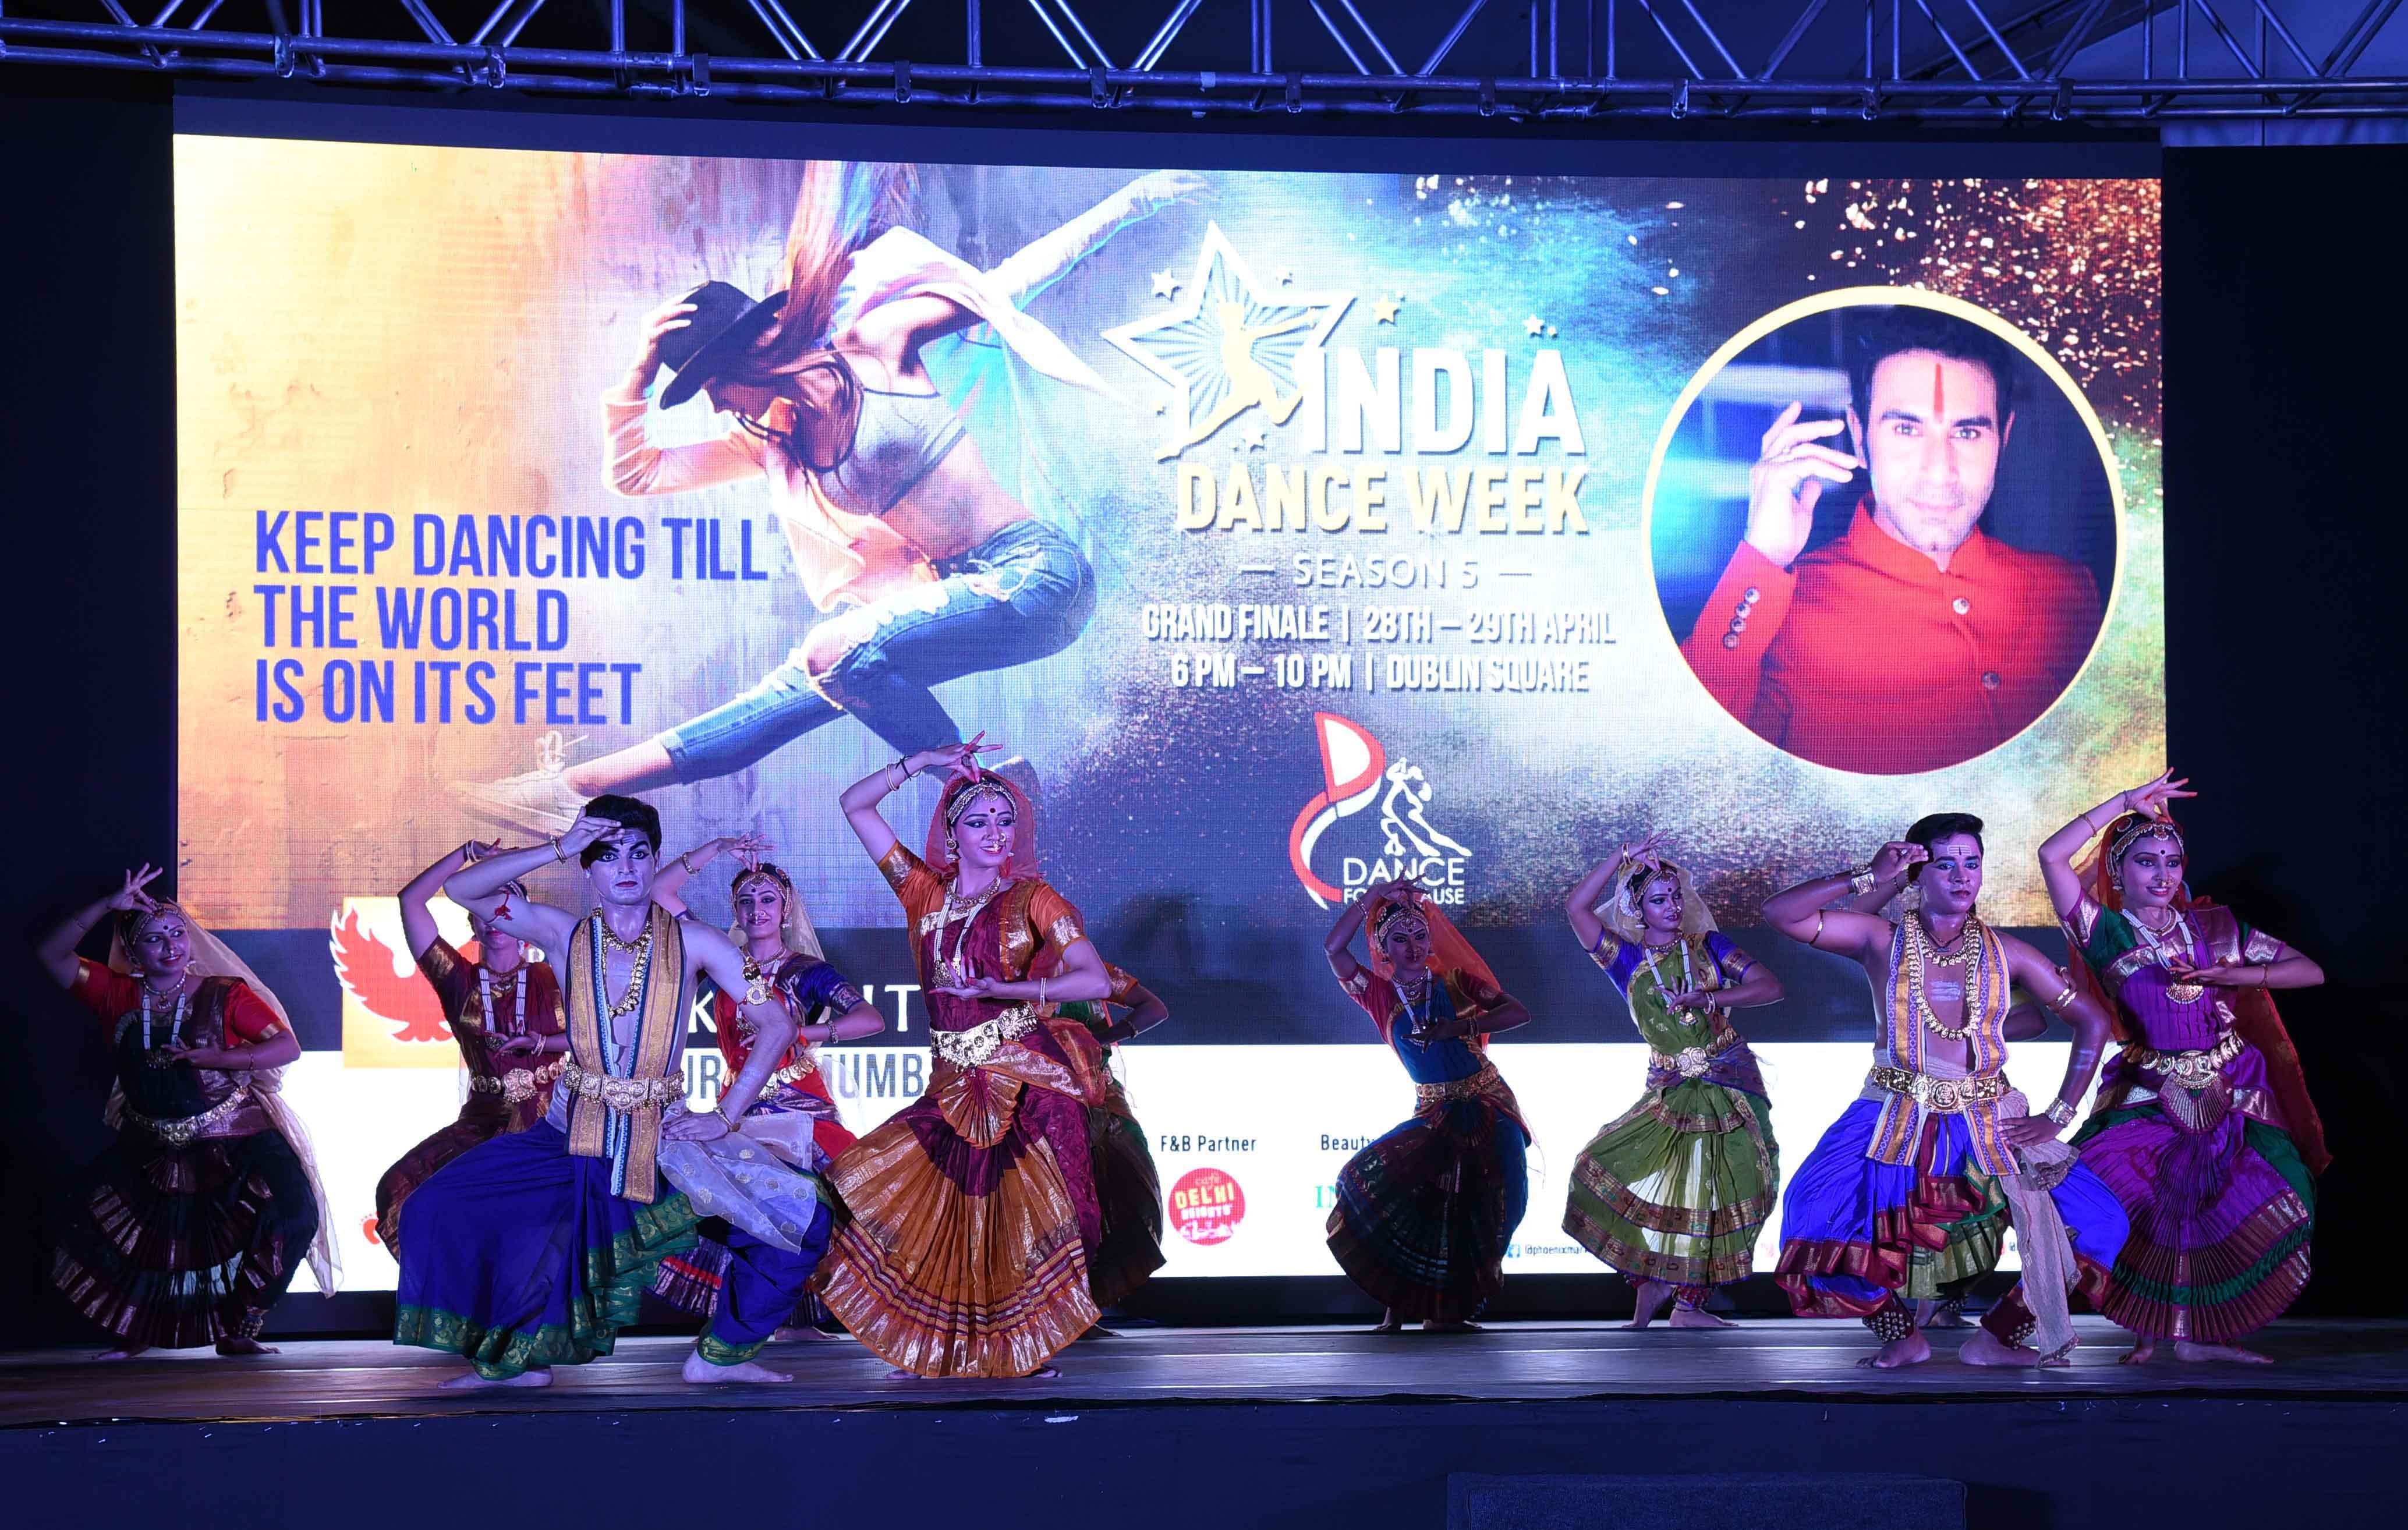 India Dance Week